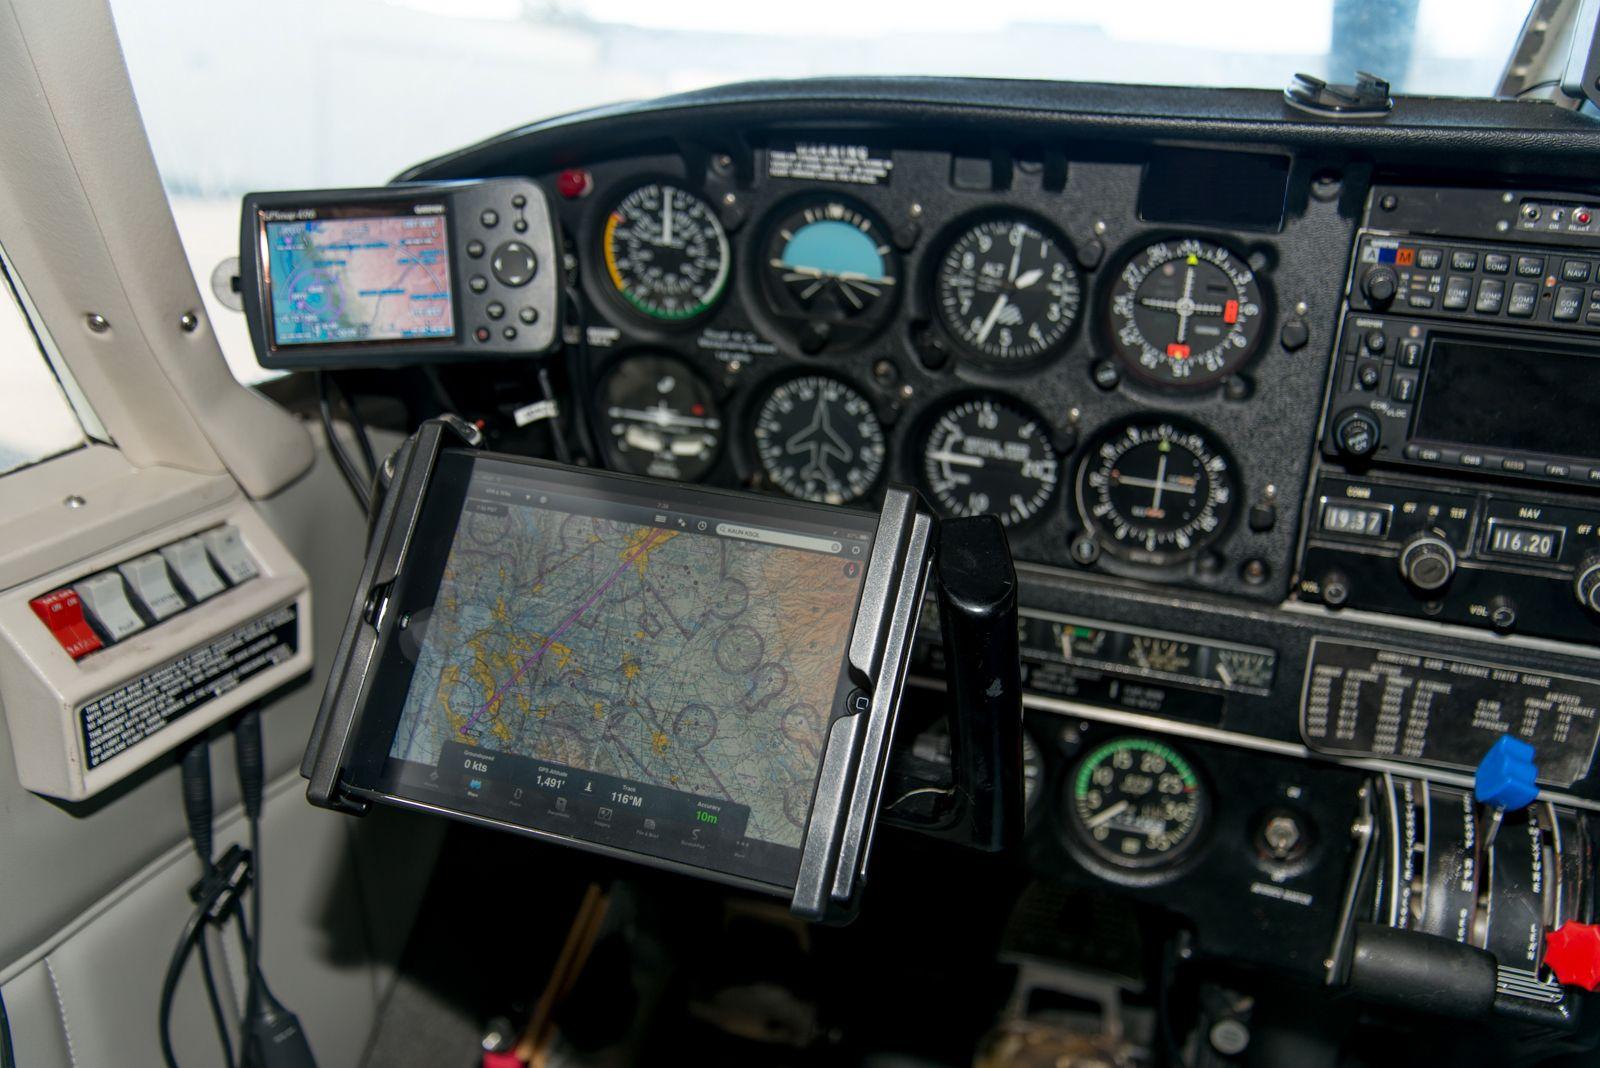 Ipad Cockpit Yoke Mount Gallery Article